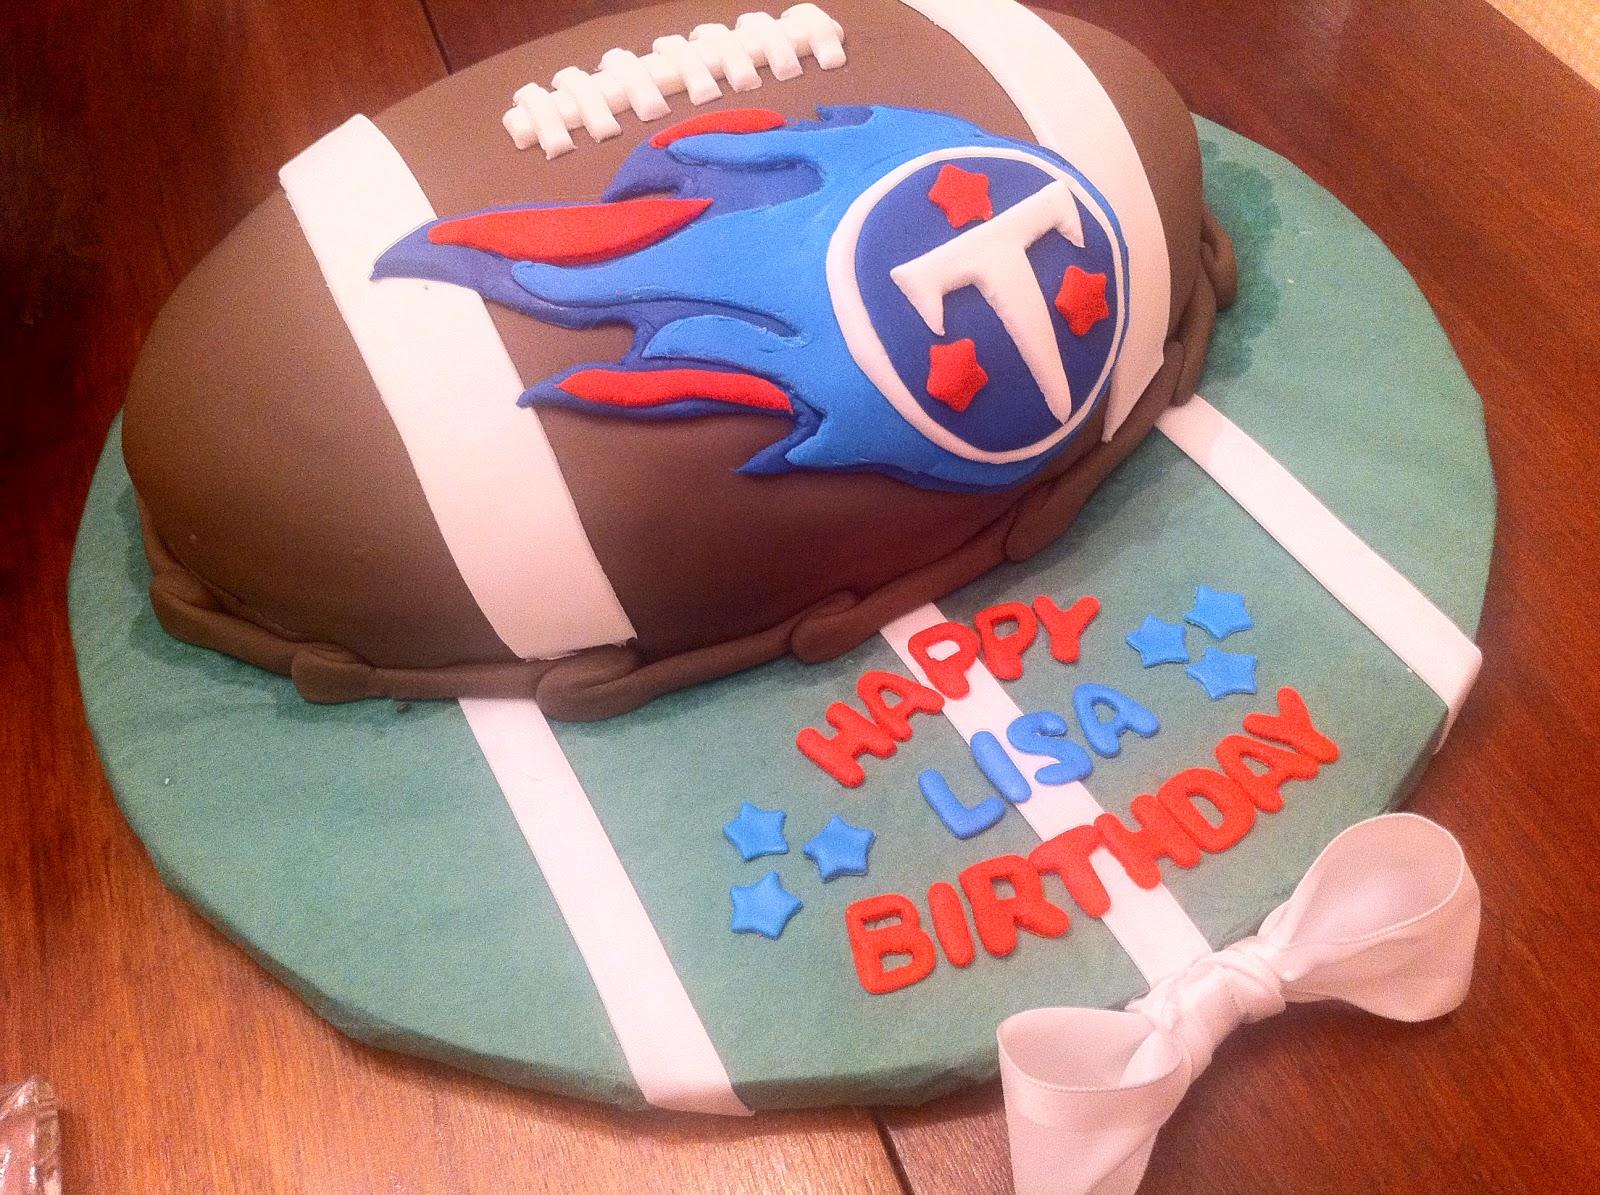 52 Weeks Of Sweets Week 28b Tennessee Titans Cake